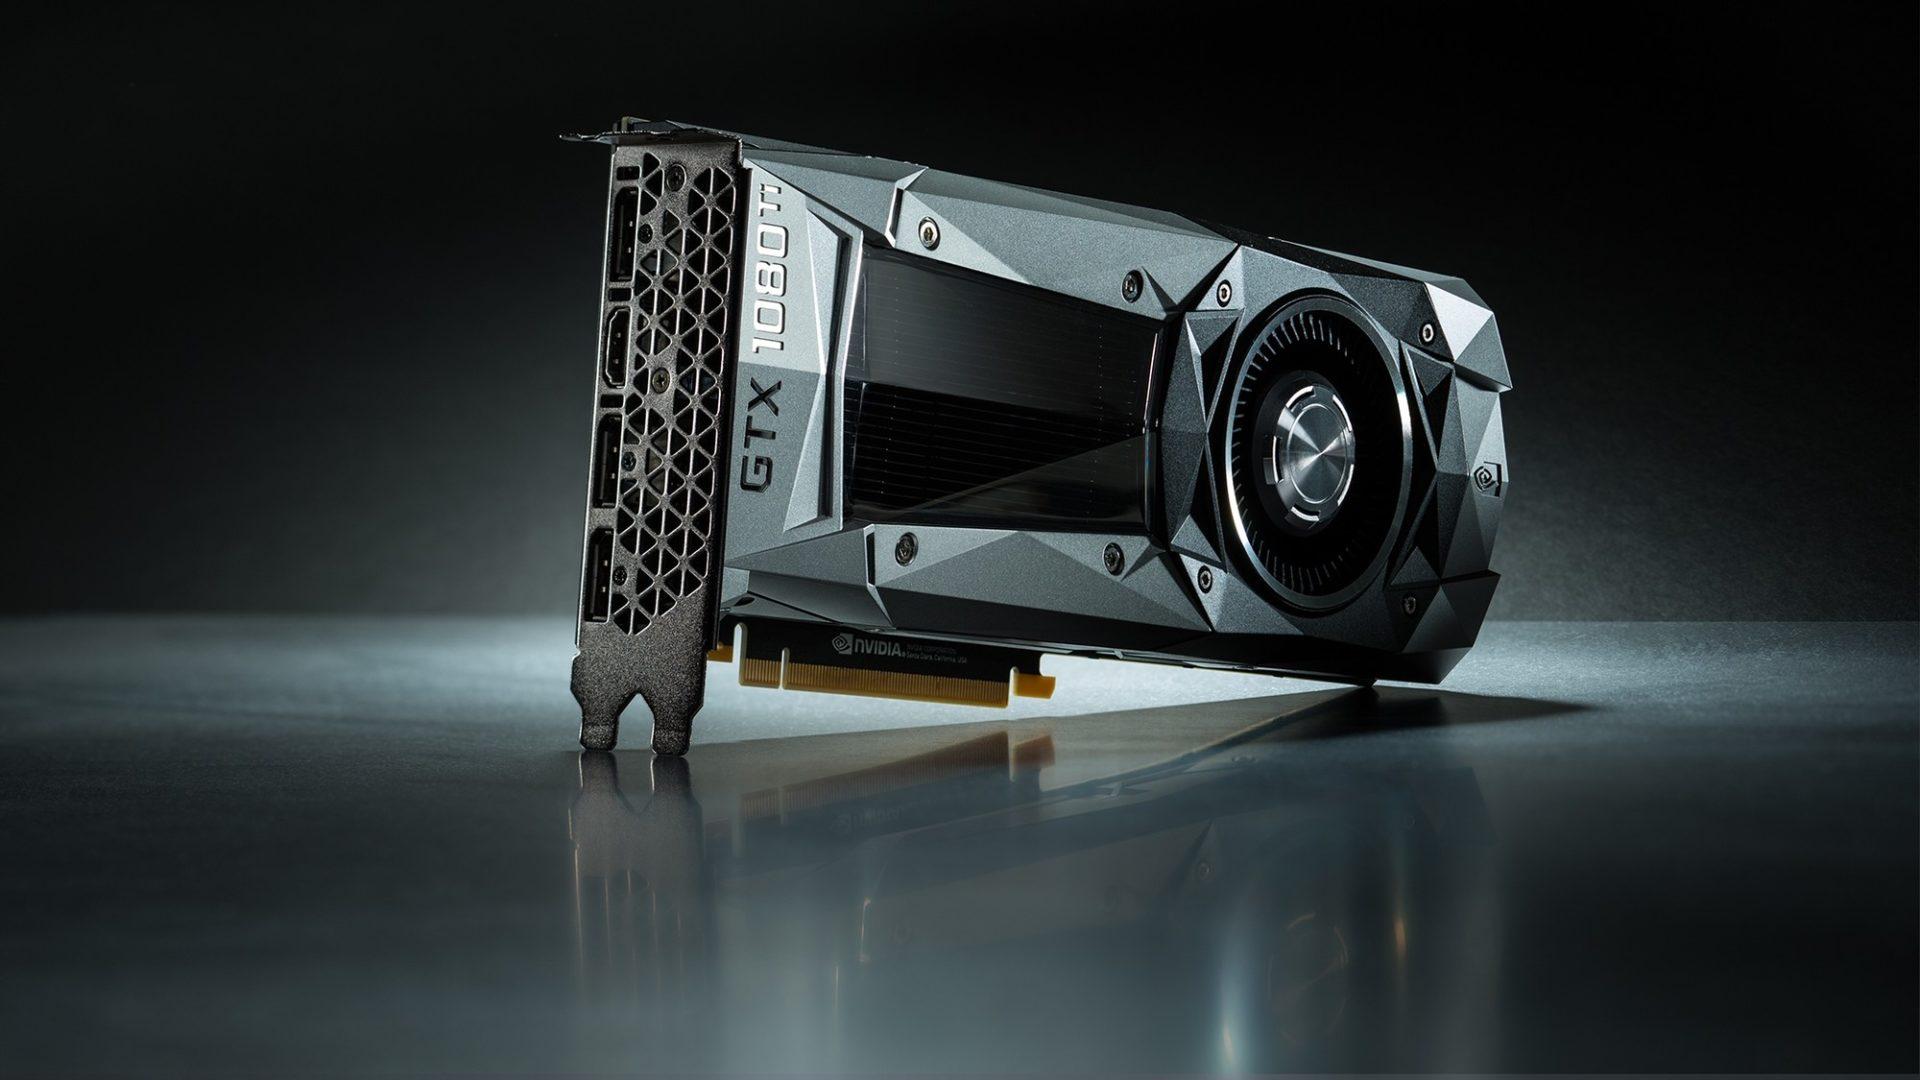 NVIDIA-GeForce-GTX-1080-Ti-GPU-Ultimate_1-1920x1080